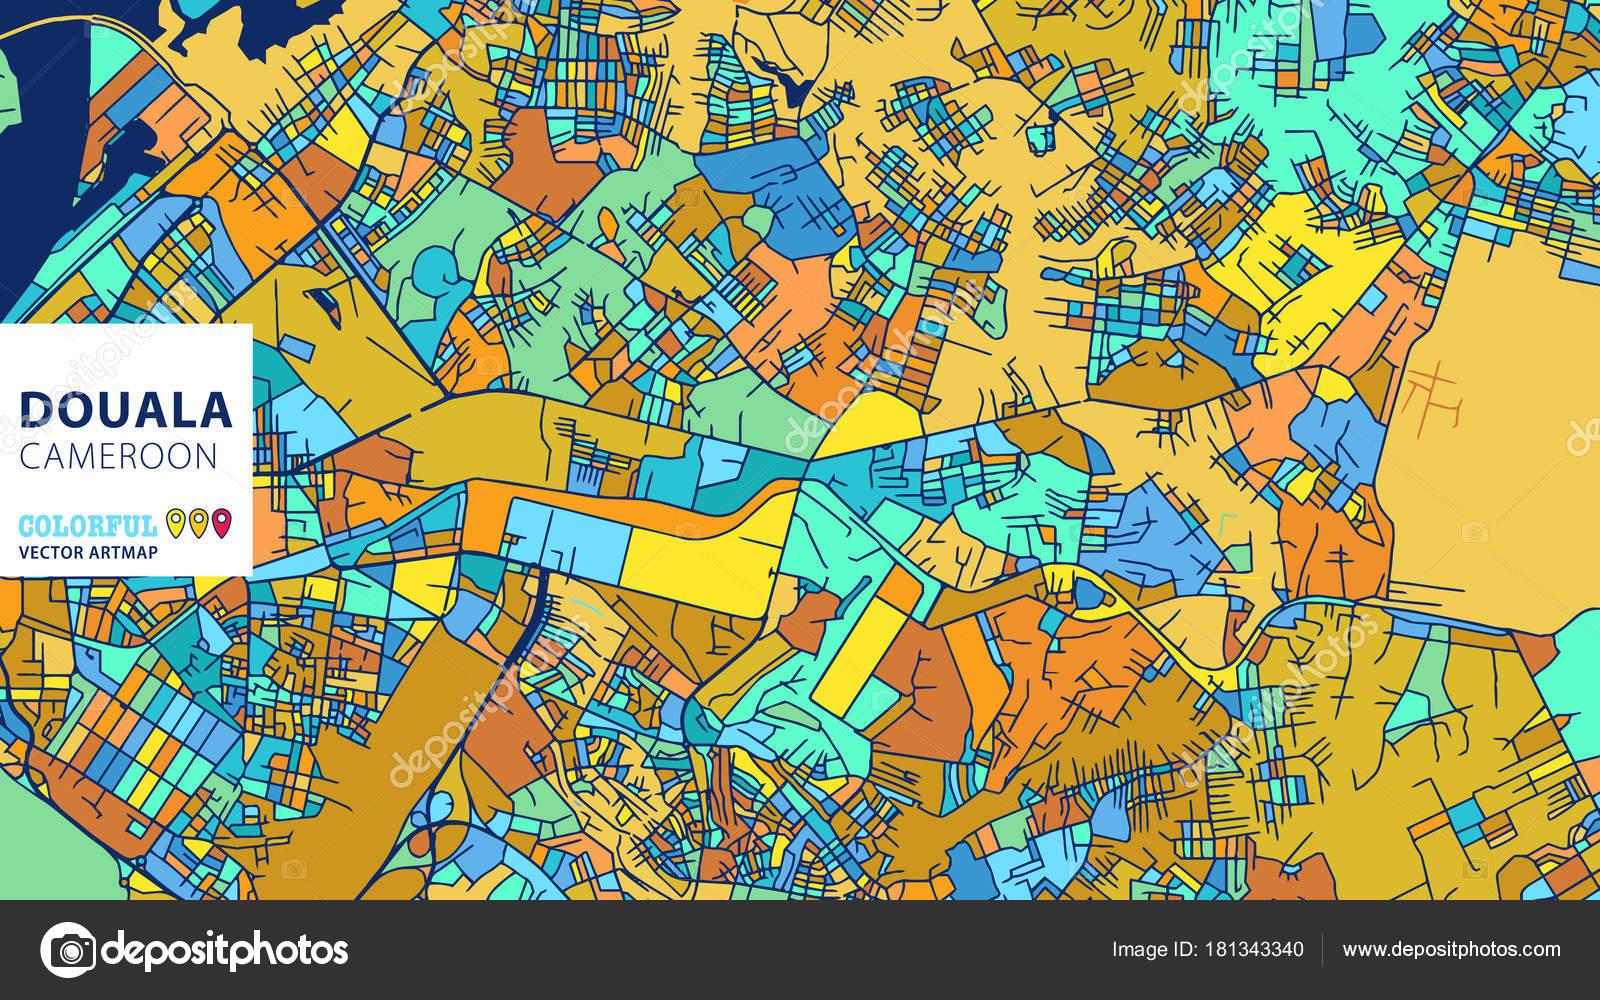 Douala Cameroon Colorful Vector Artmap Stock Vector mail